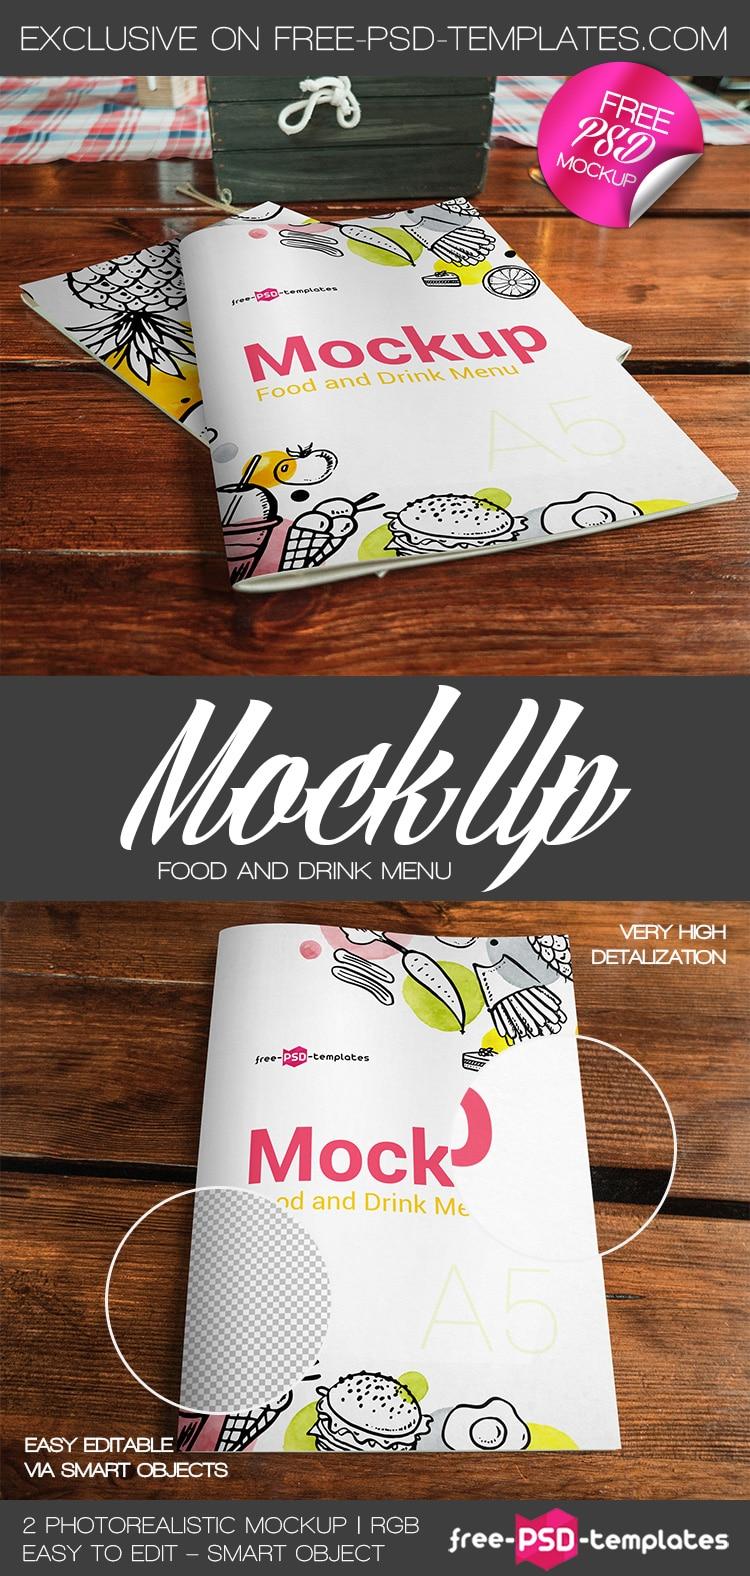 2 food and drink menu PSD mockups